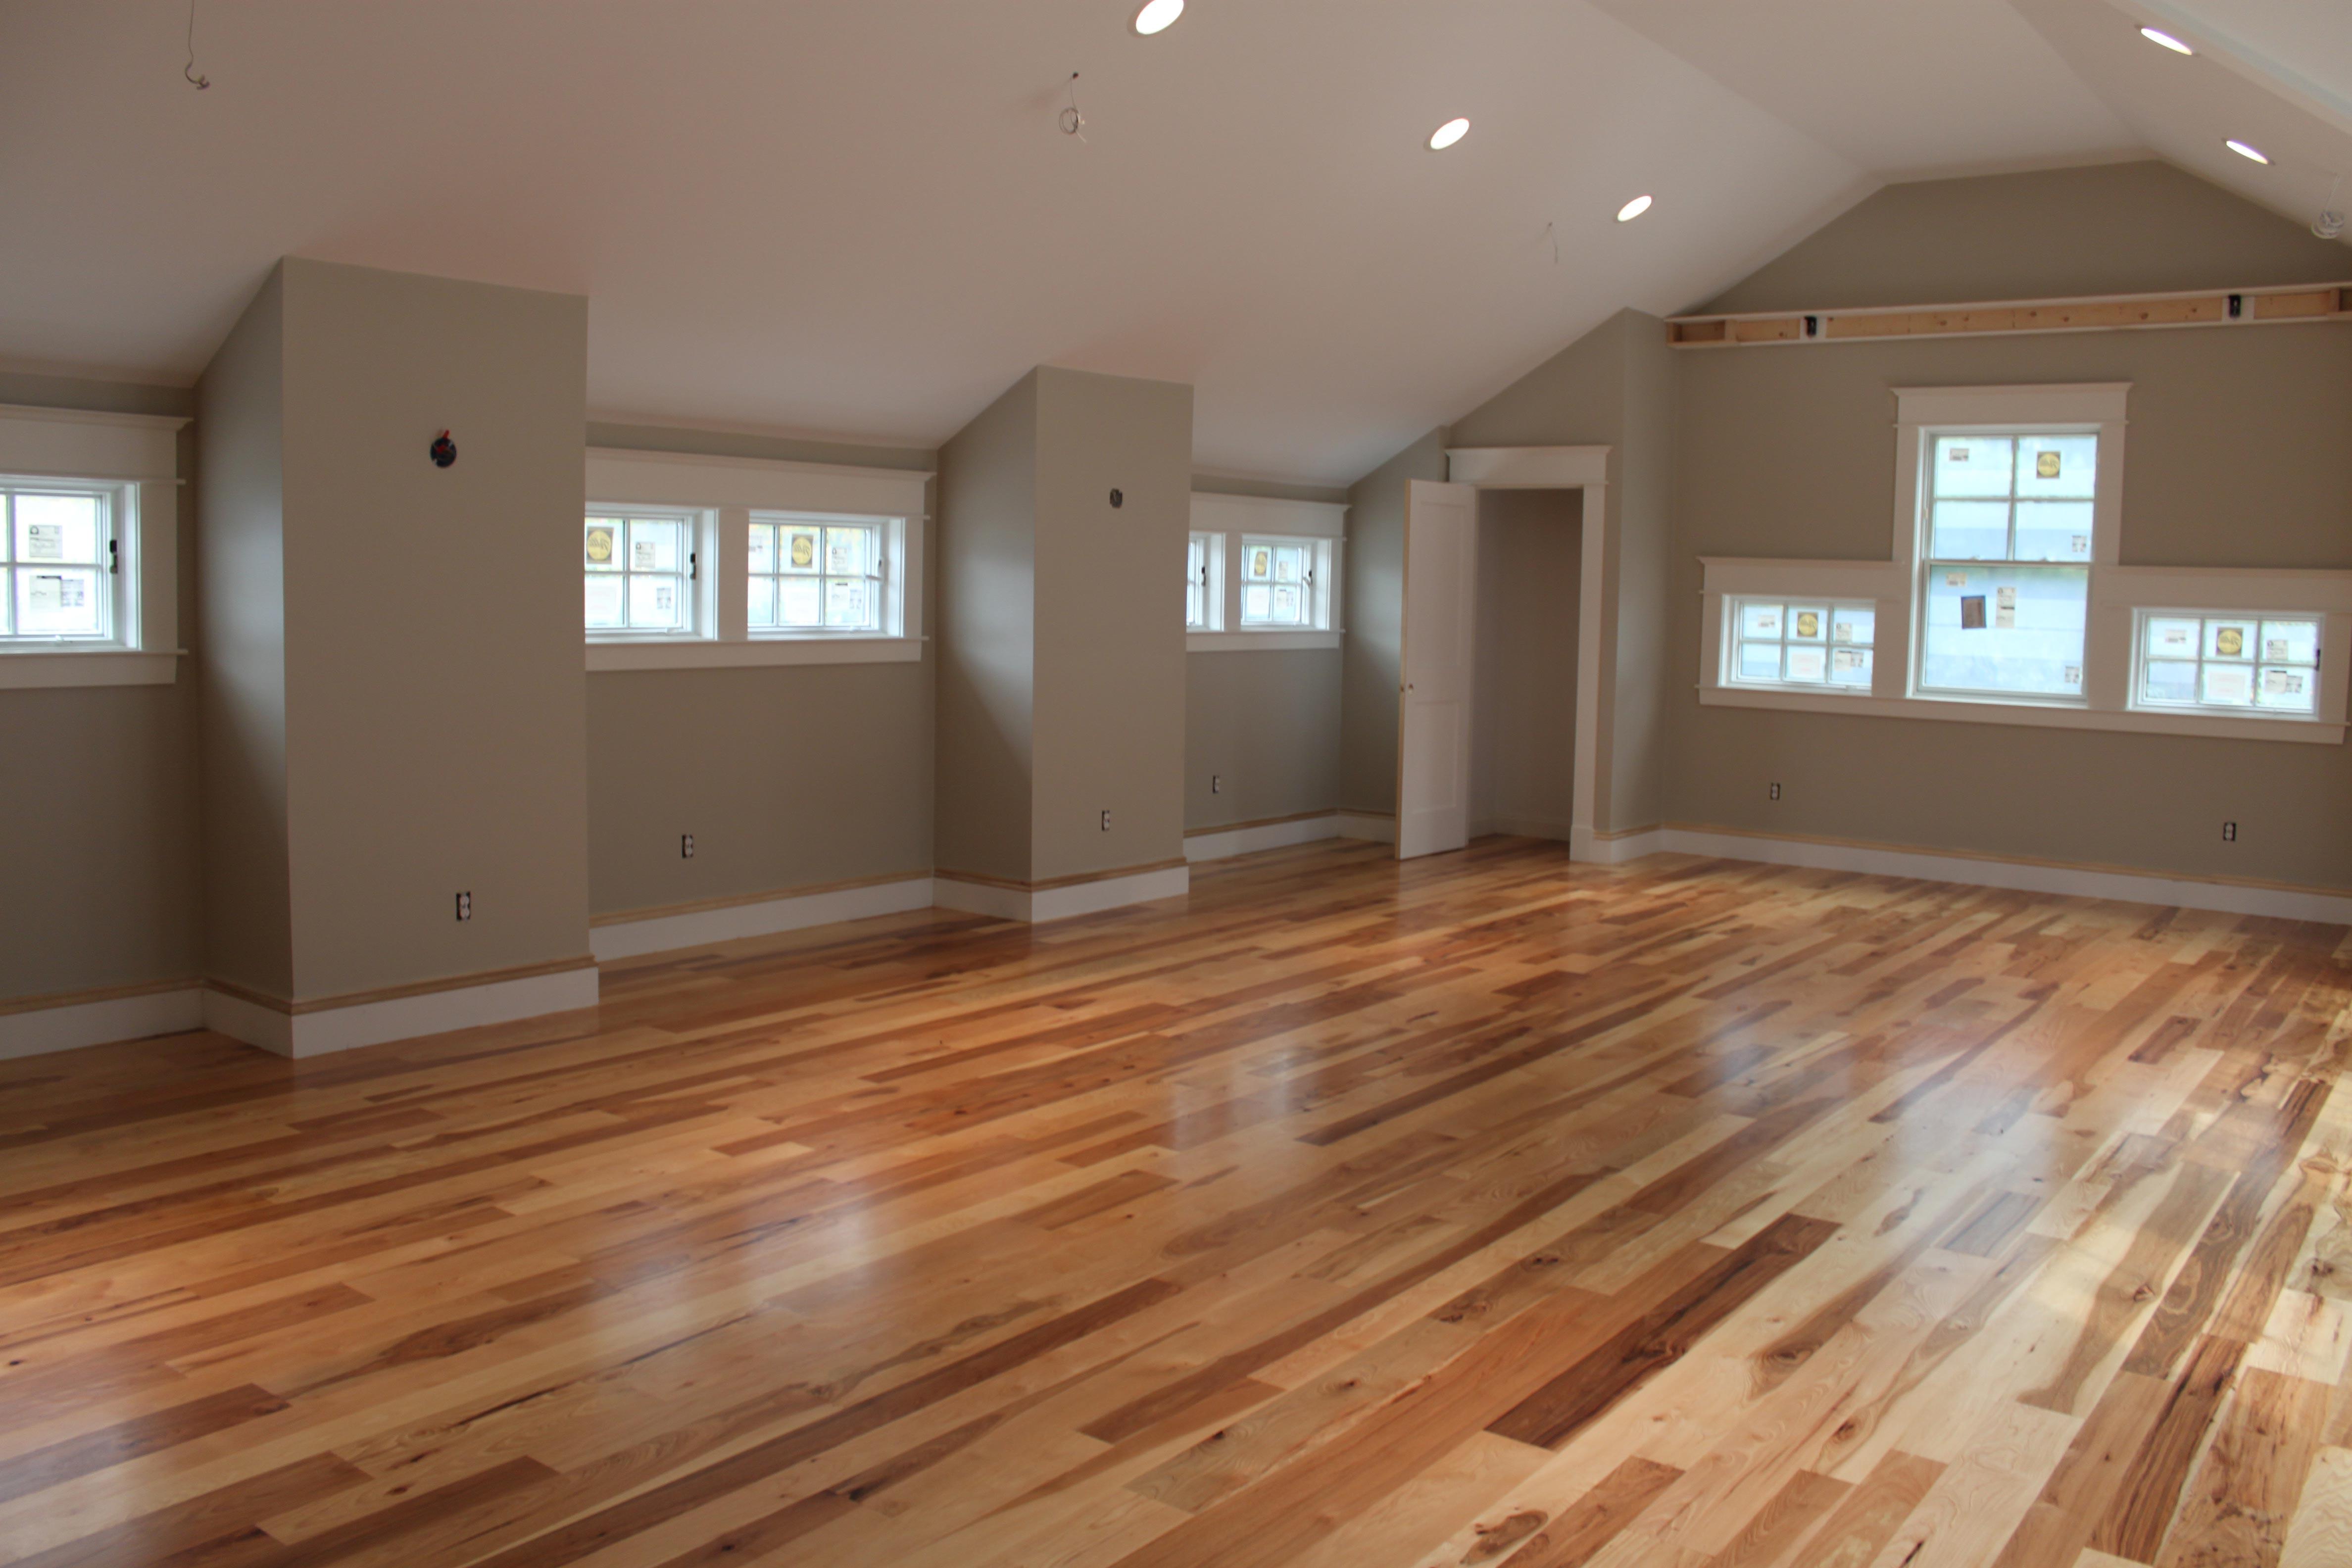 hardwood floors the top surface finishes for hardwood flooring TUKPKBW